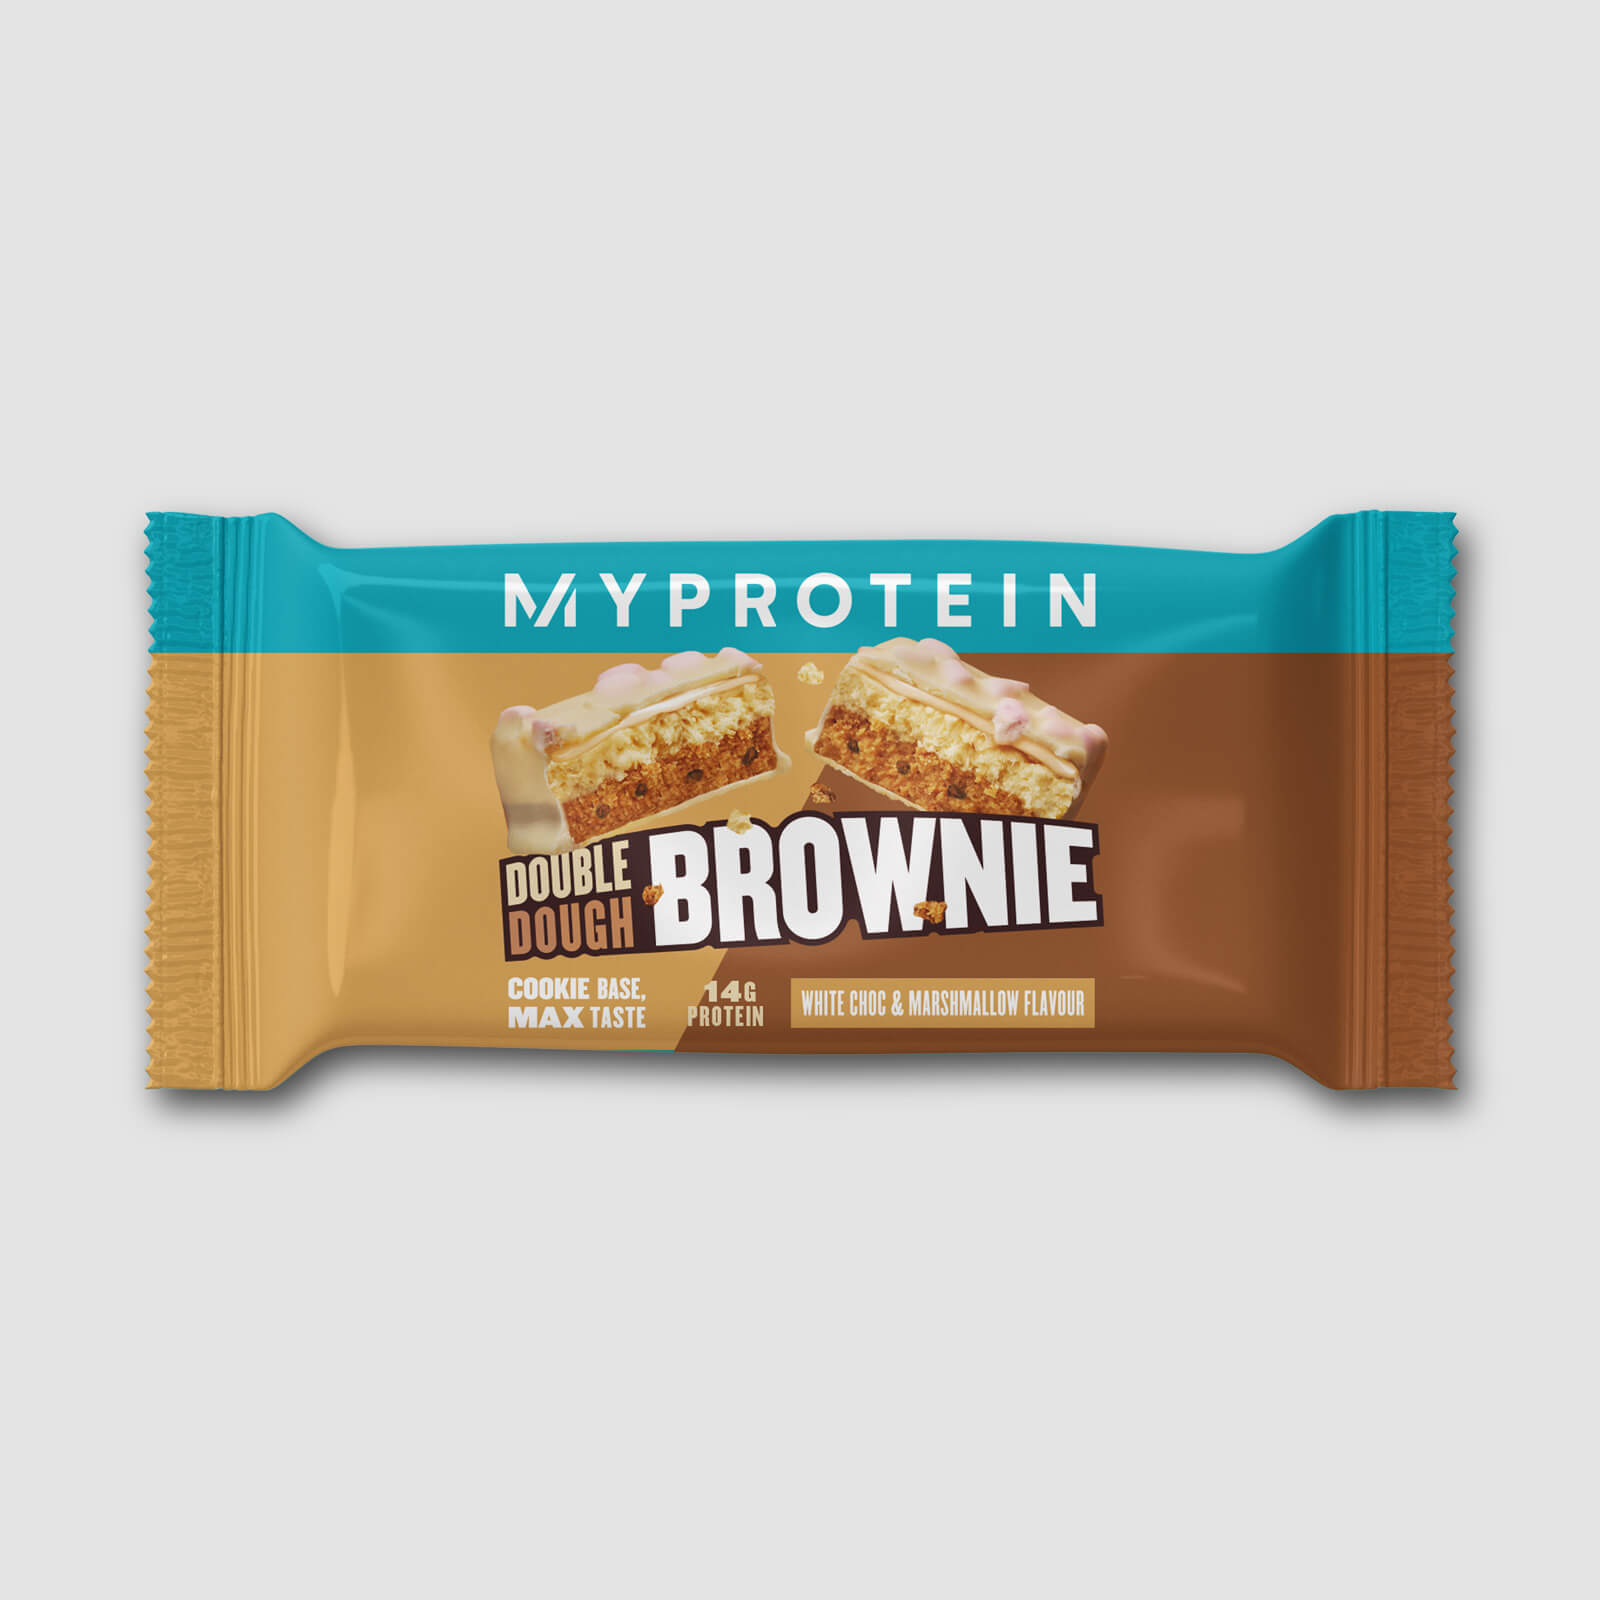 Купить Печенье с брауни (пробник) - 60g - White Chocolate and Marshmallow, Myprotein International